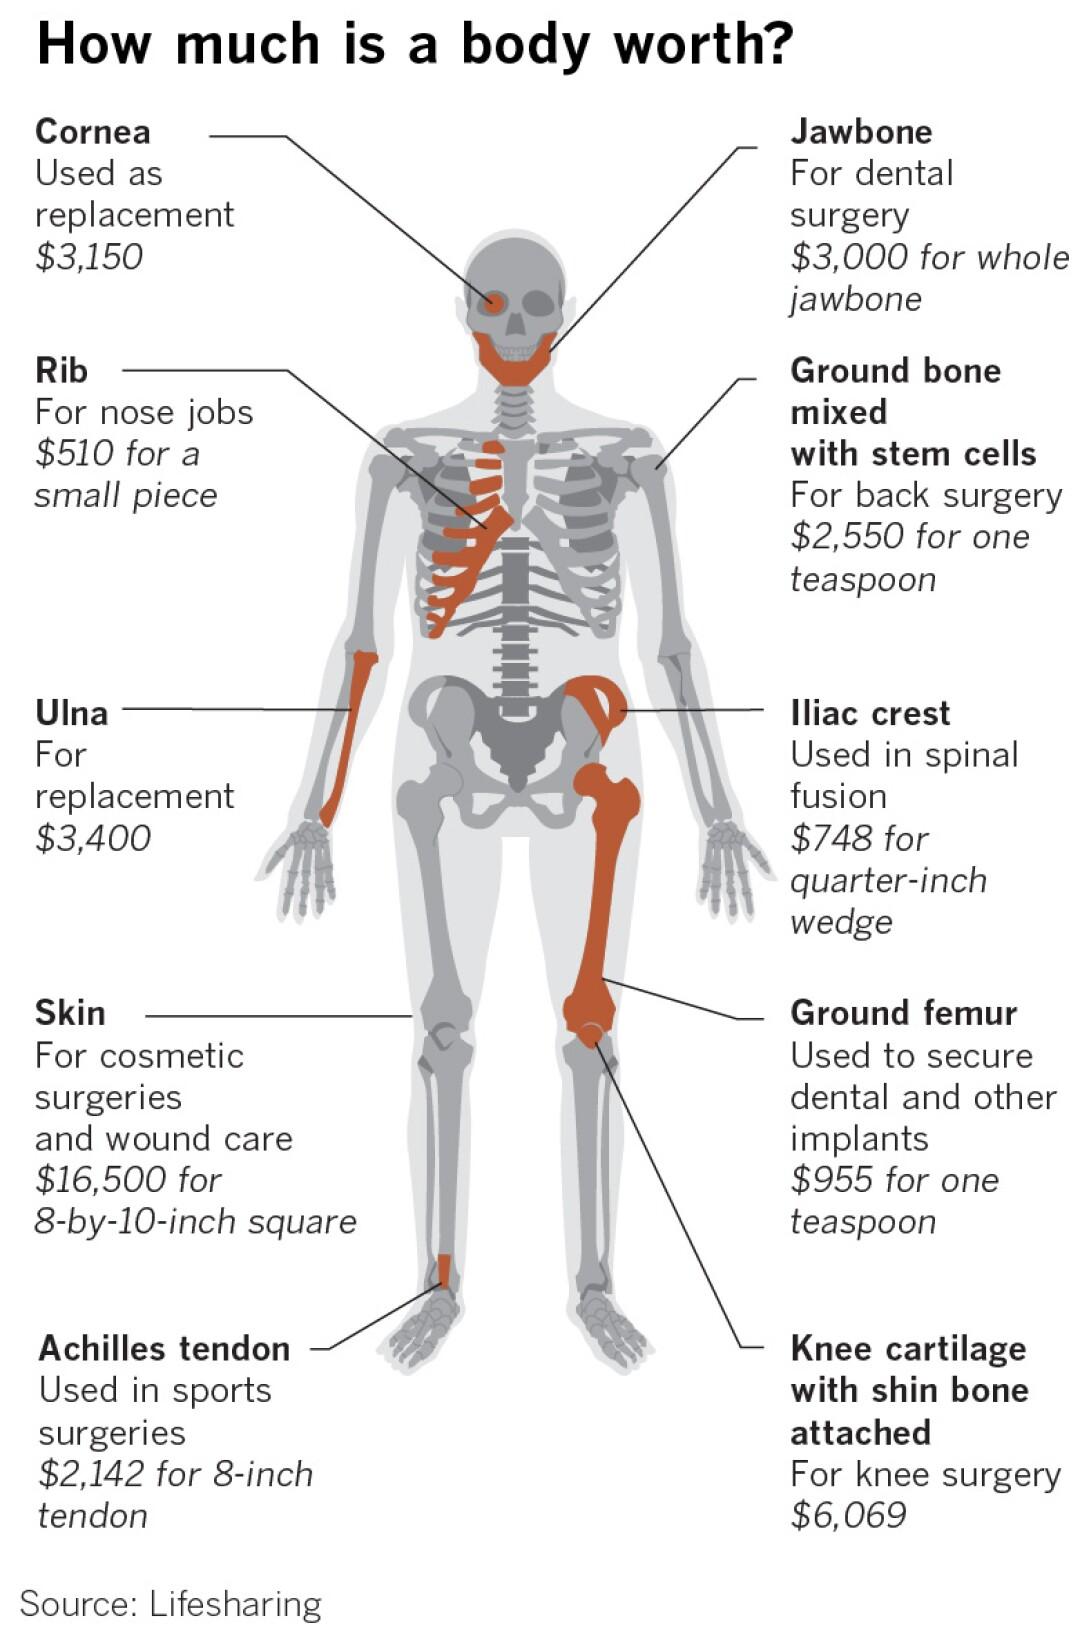 462298-w0-la-fi-body-parts-coroners-explainer.jpg